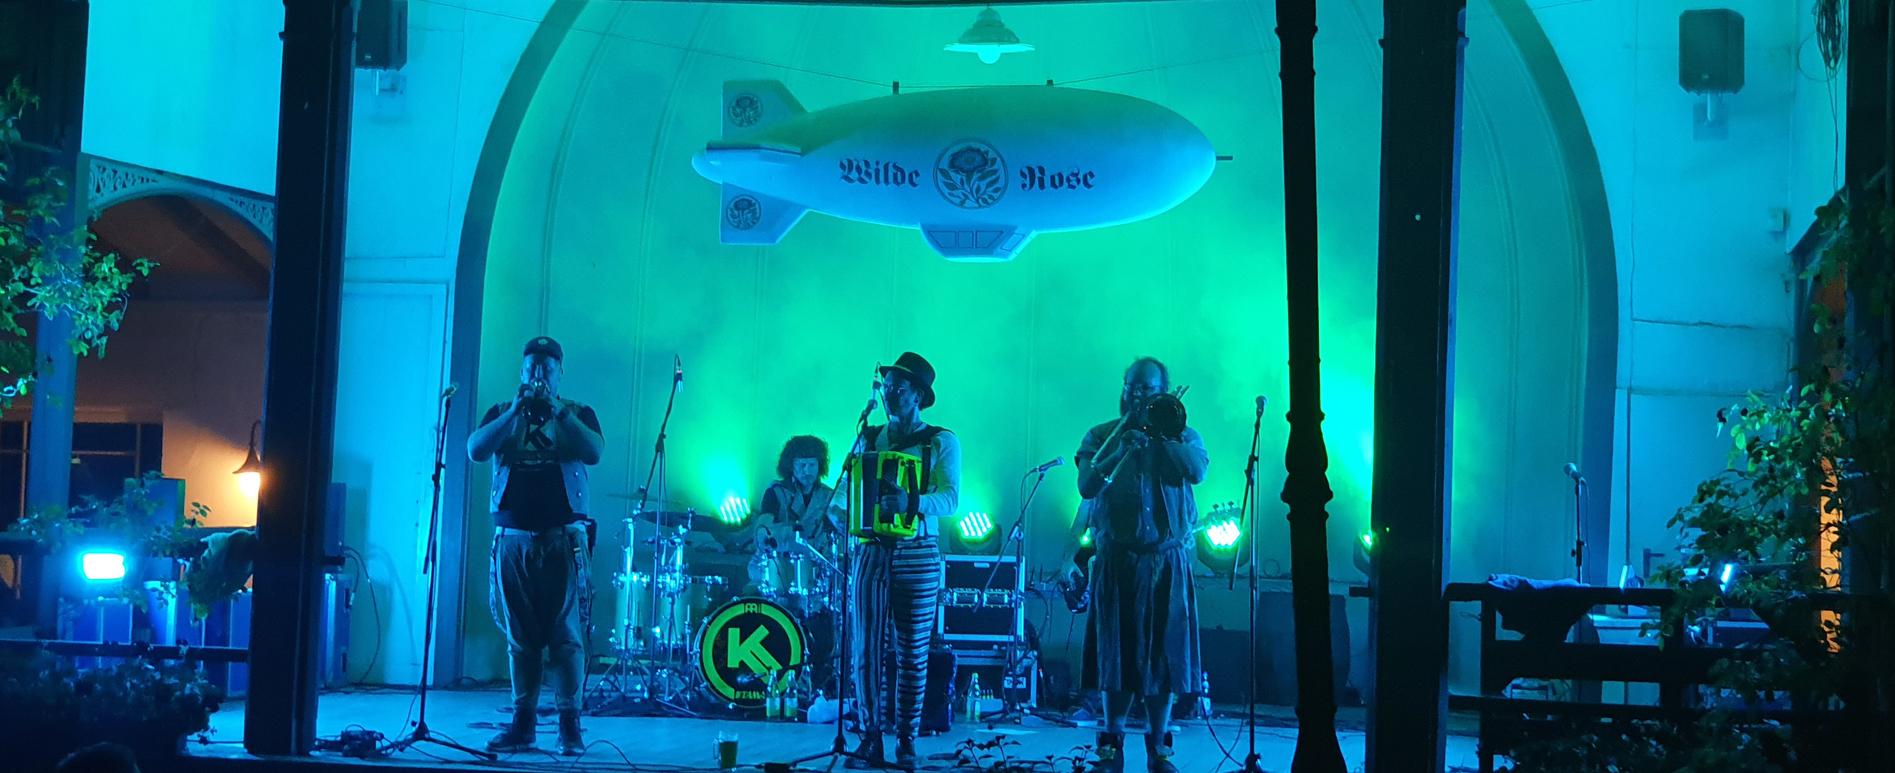 Wilde-Rose-Keller-Bamberg-Veranstaltungsankuendigung